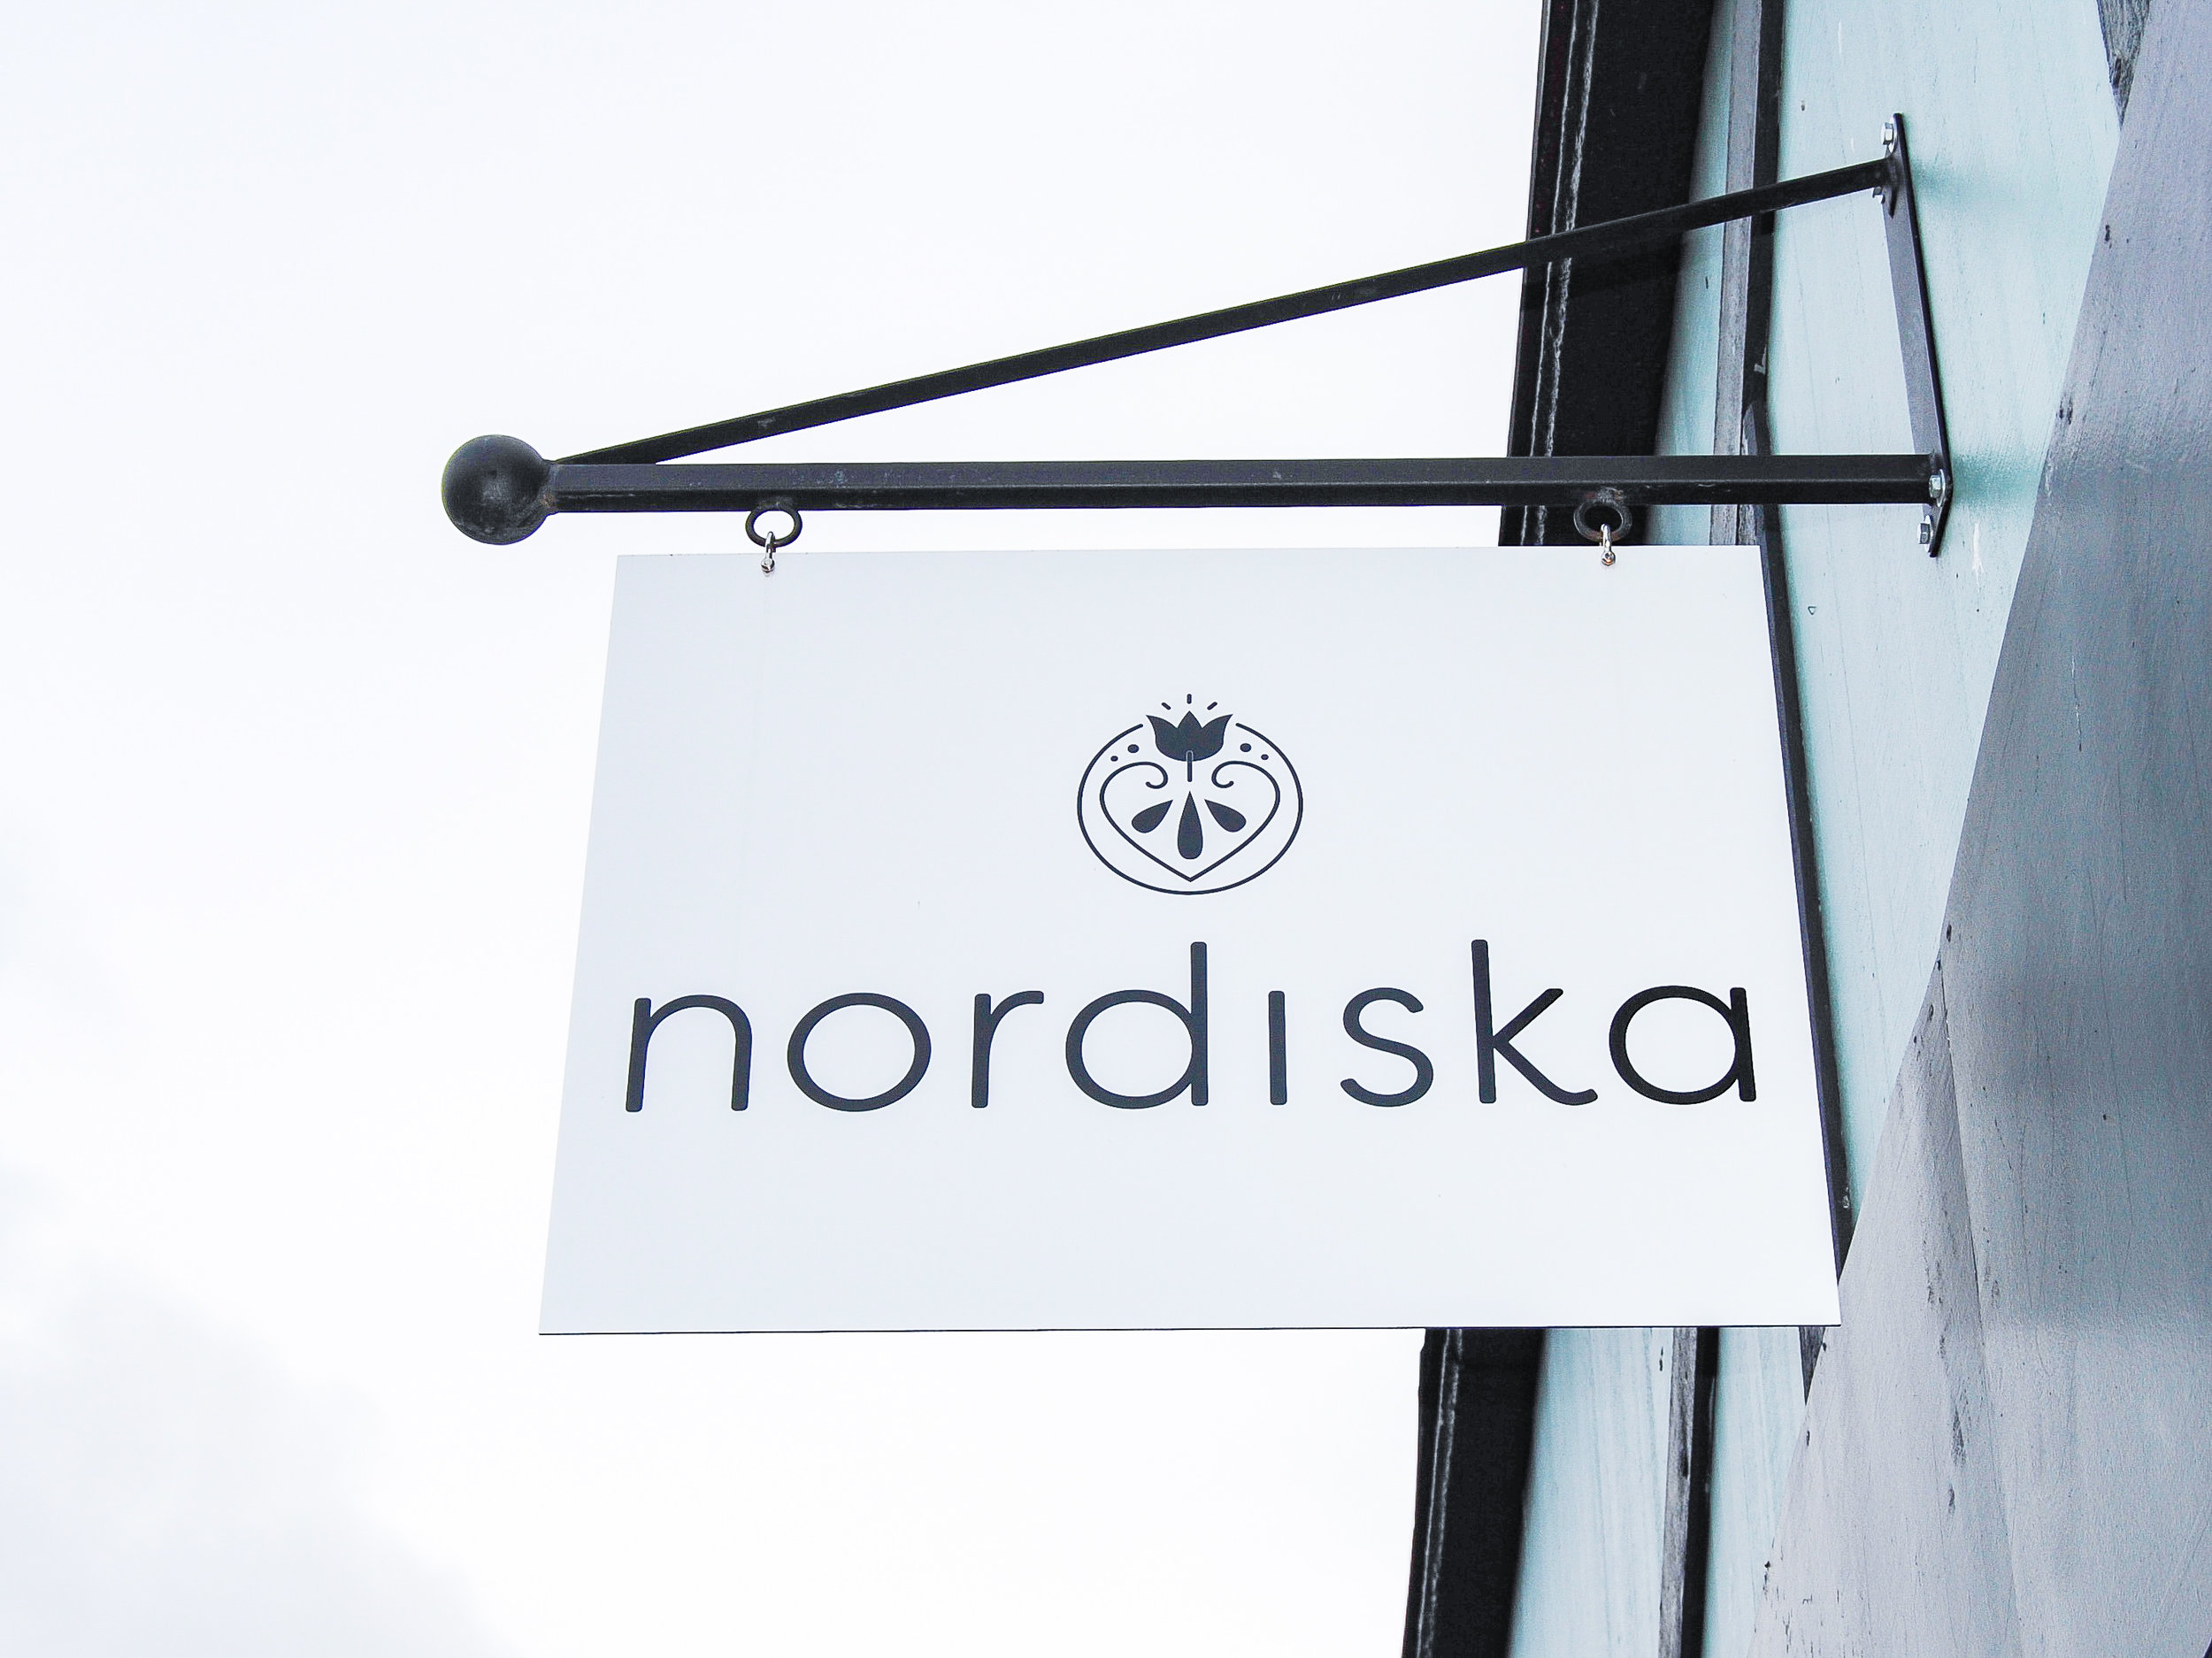 For Norwegian-inspired houseware, gifts, & kitchen goods